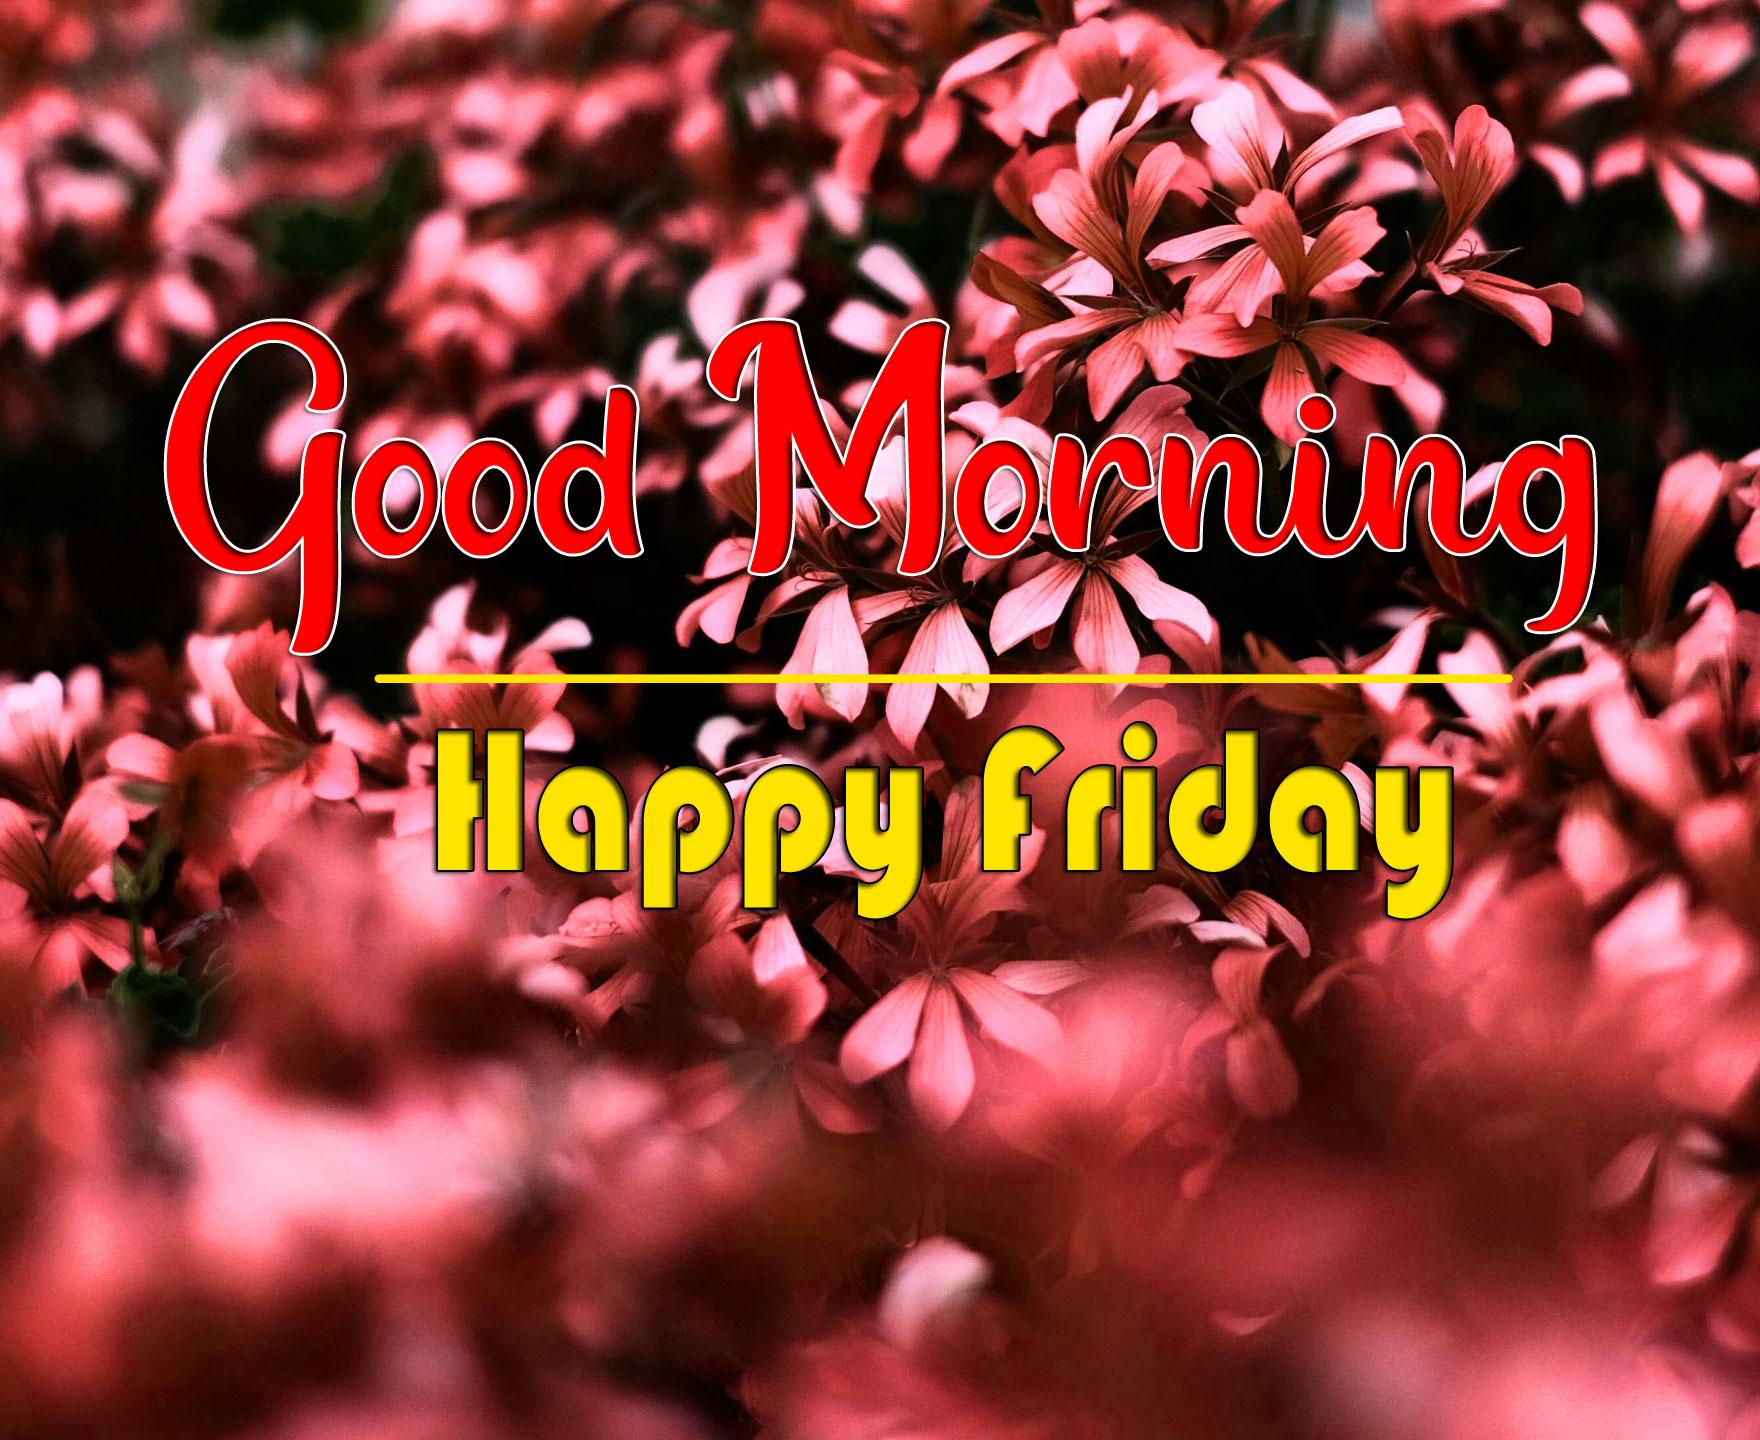 Free HD friday Good morning Images 2